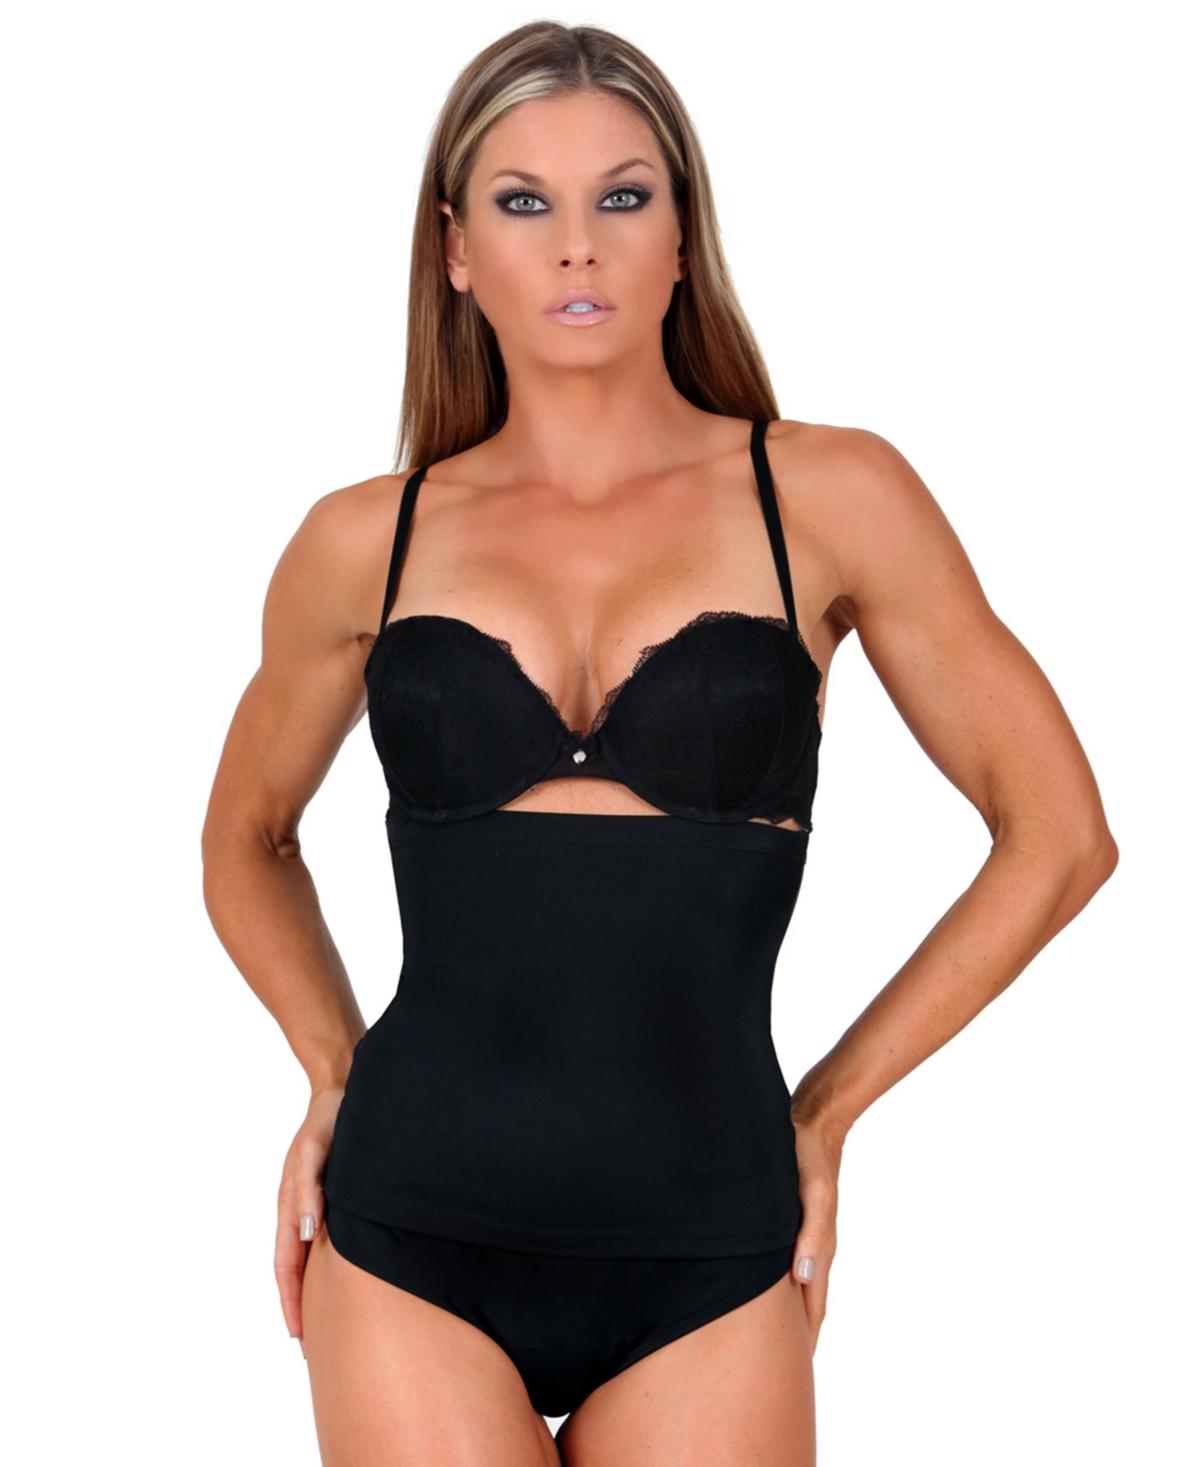 InstantFigure Compression Slimming Tummy Control Belt, Online Only